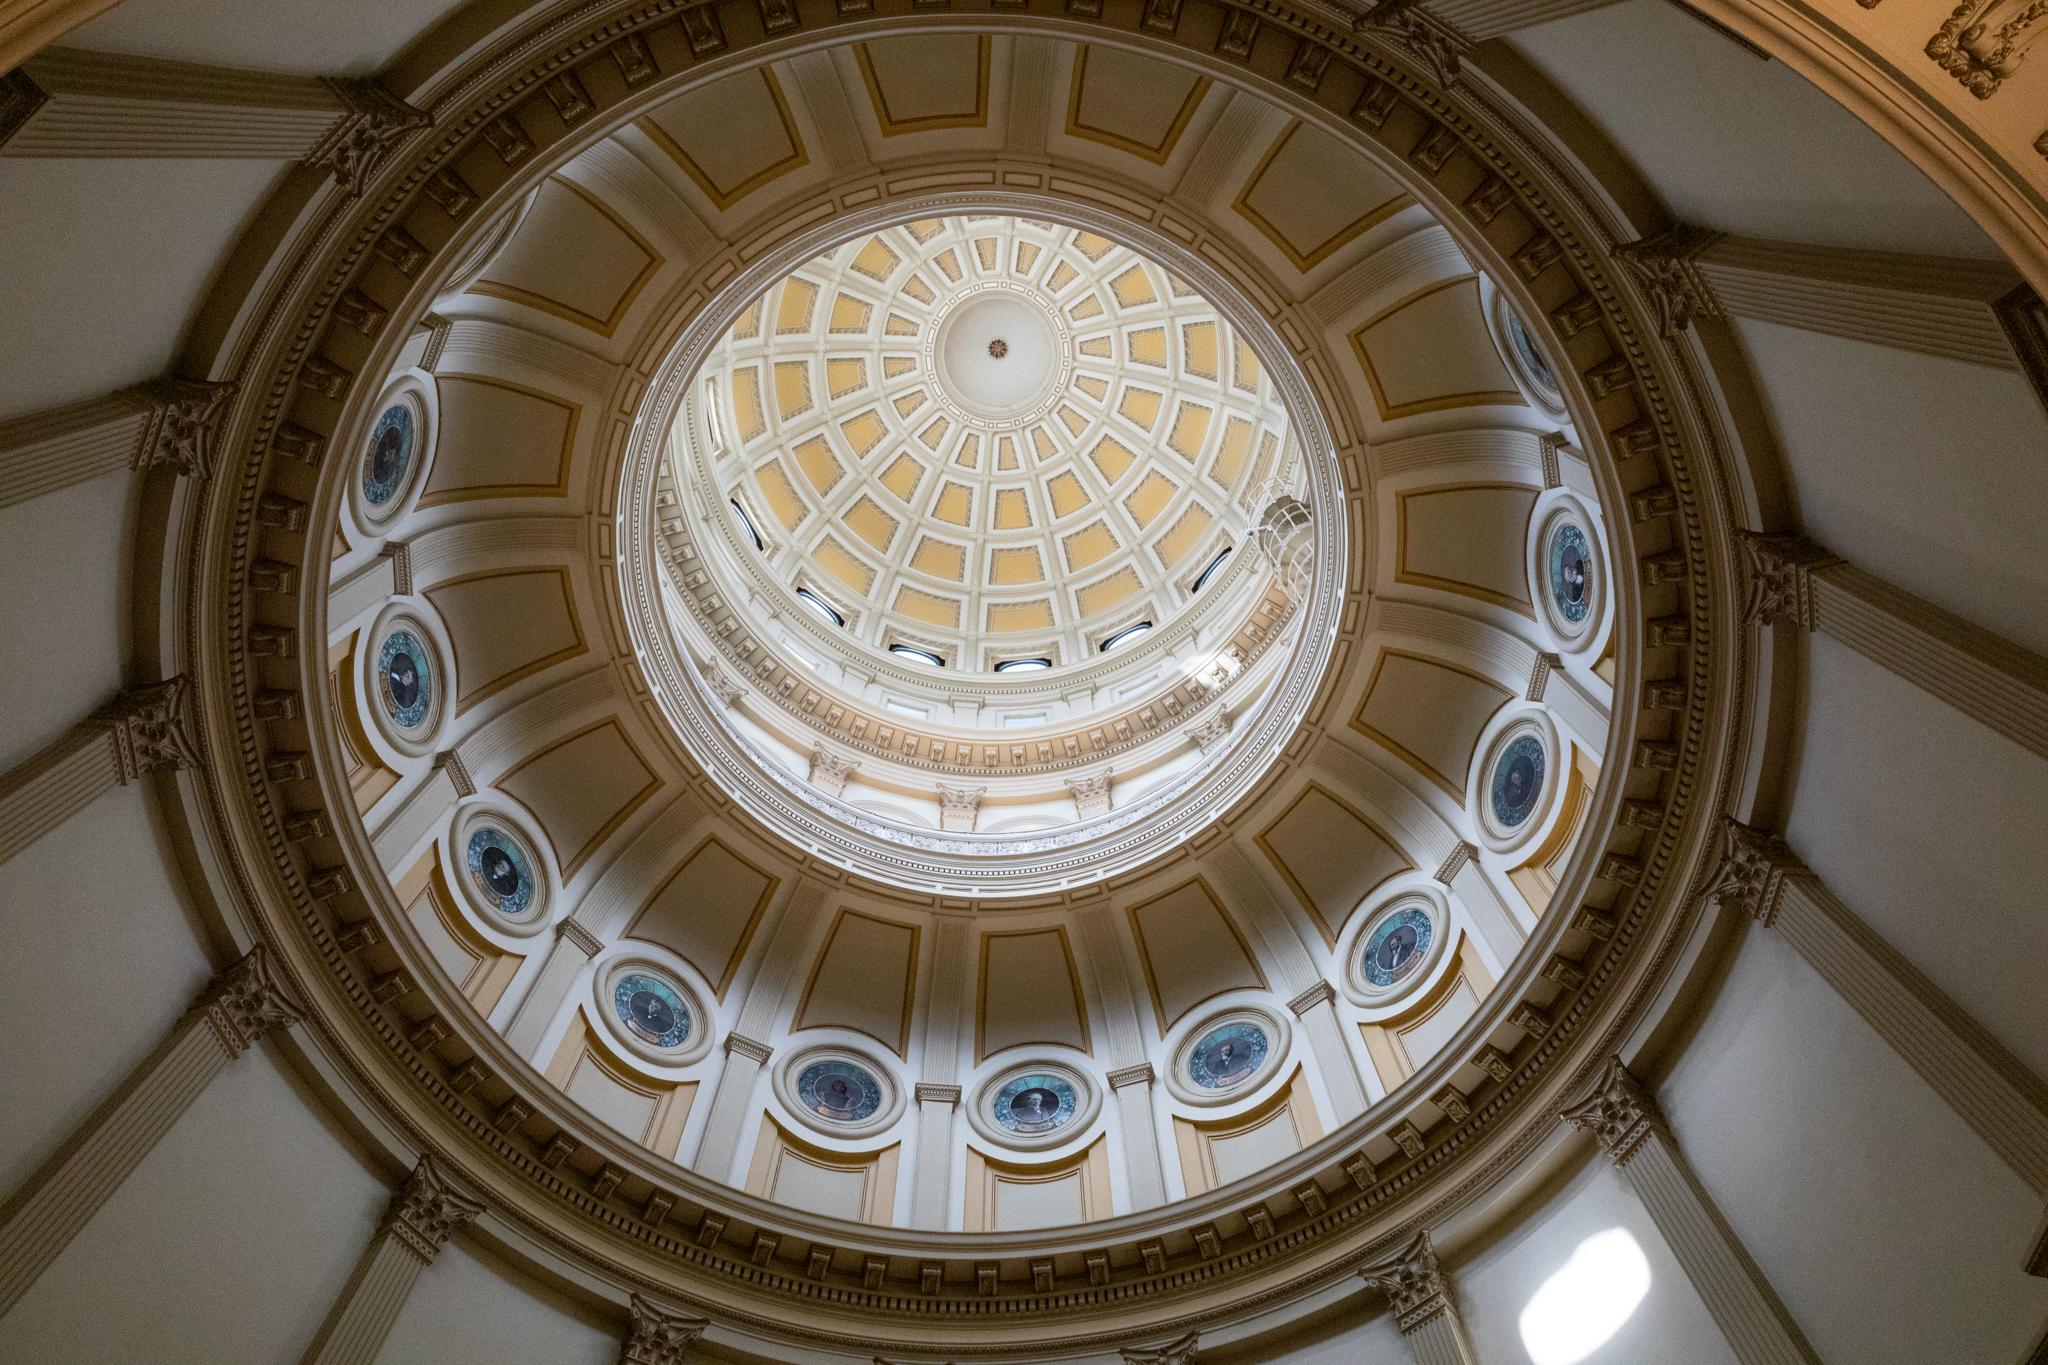 Colorado deletes public records when they matter most